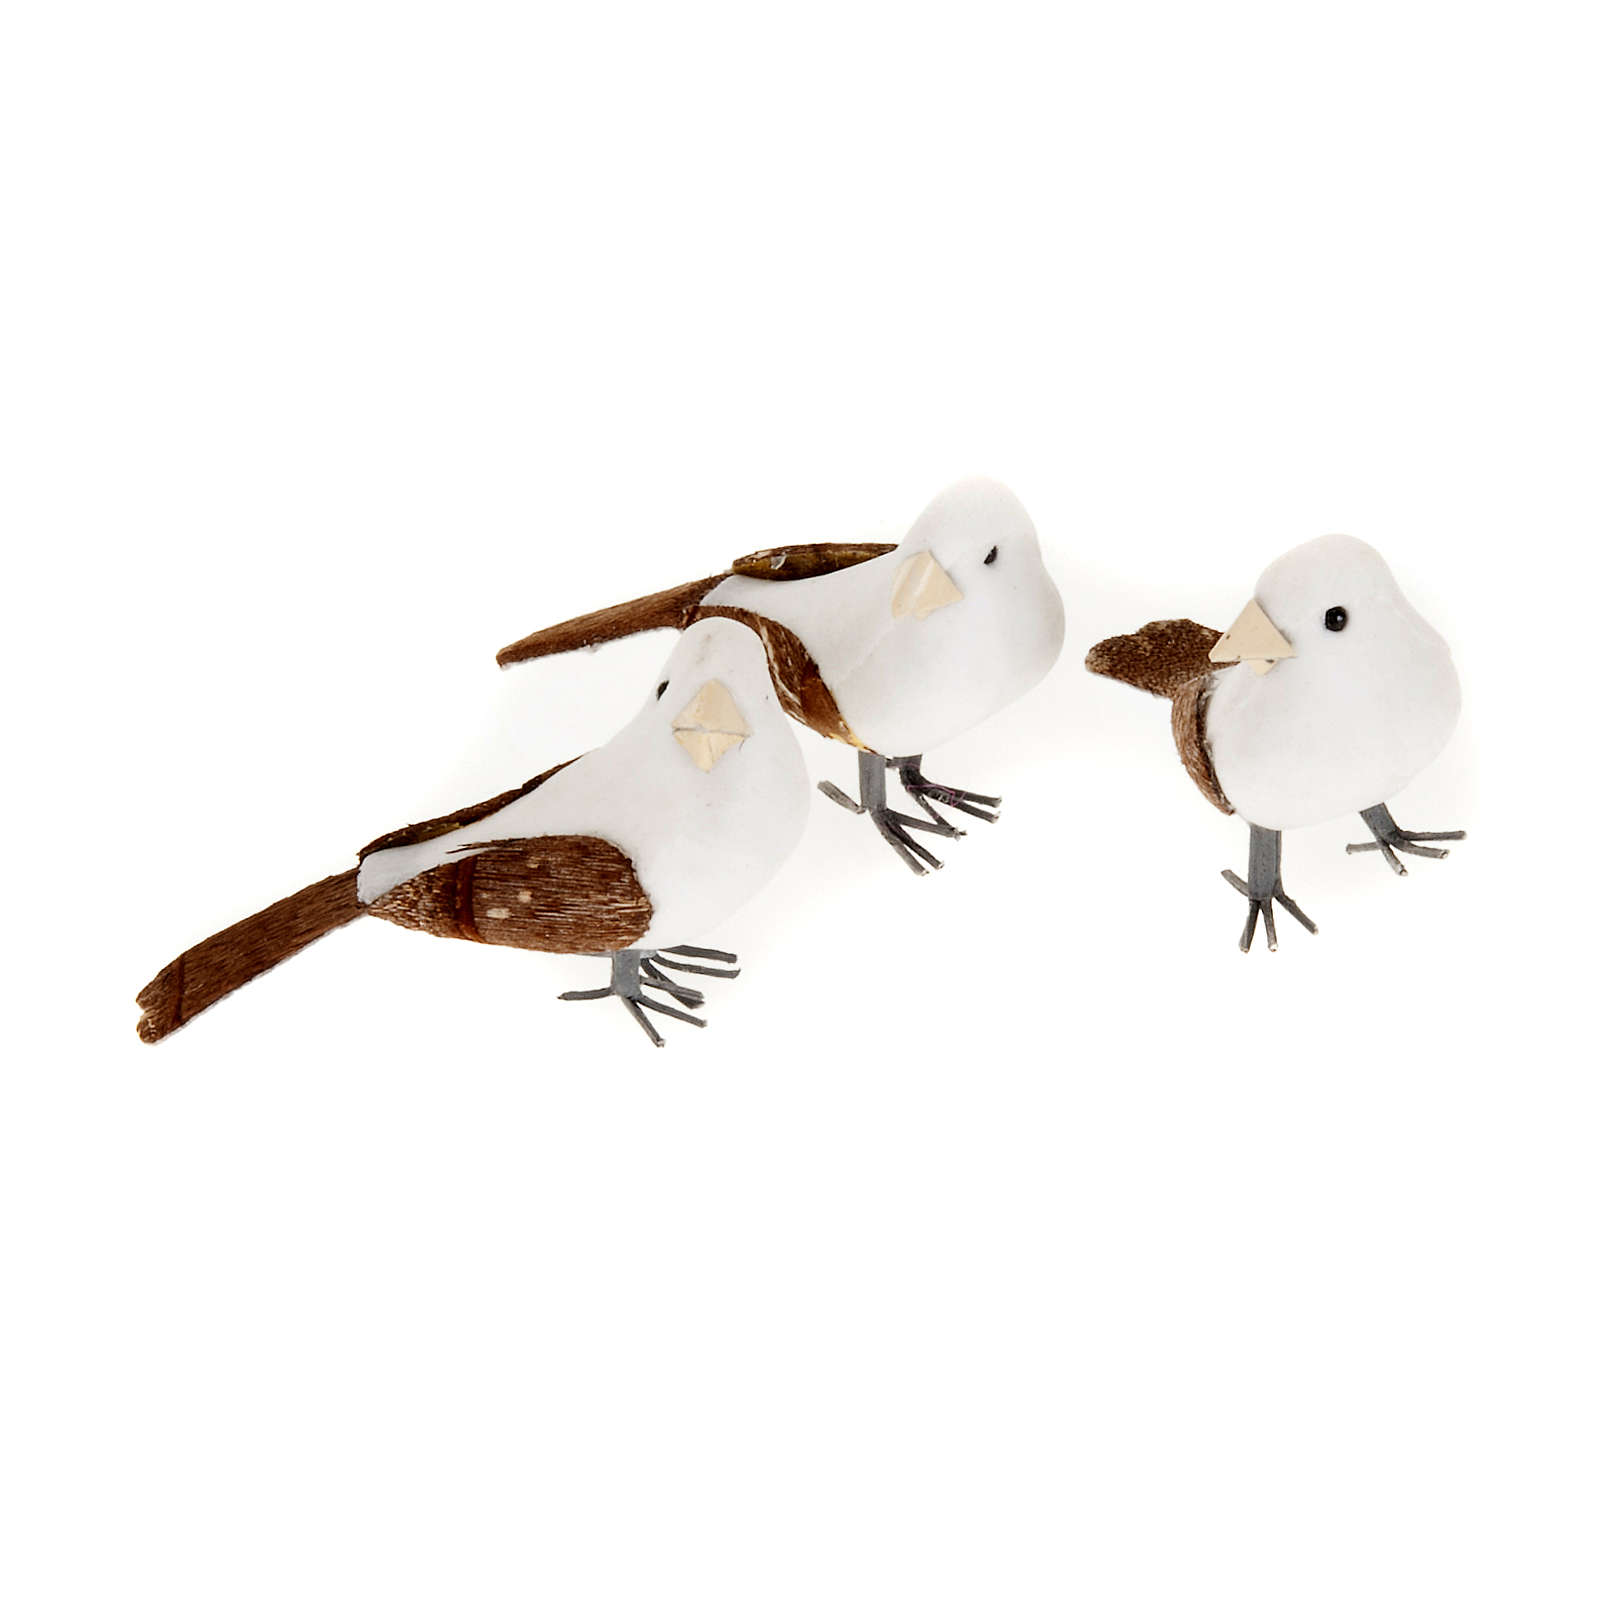 Uccellini presepe confezione 3 pz 10 cm 3